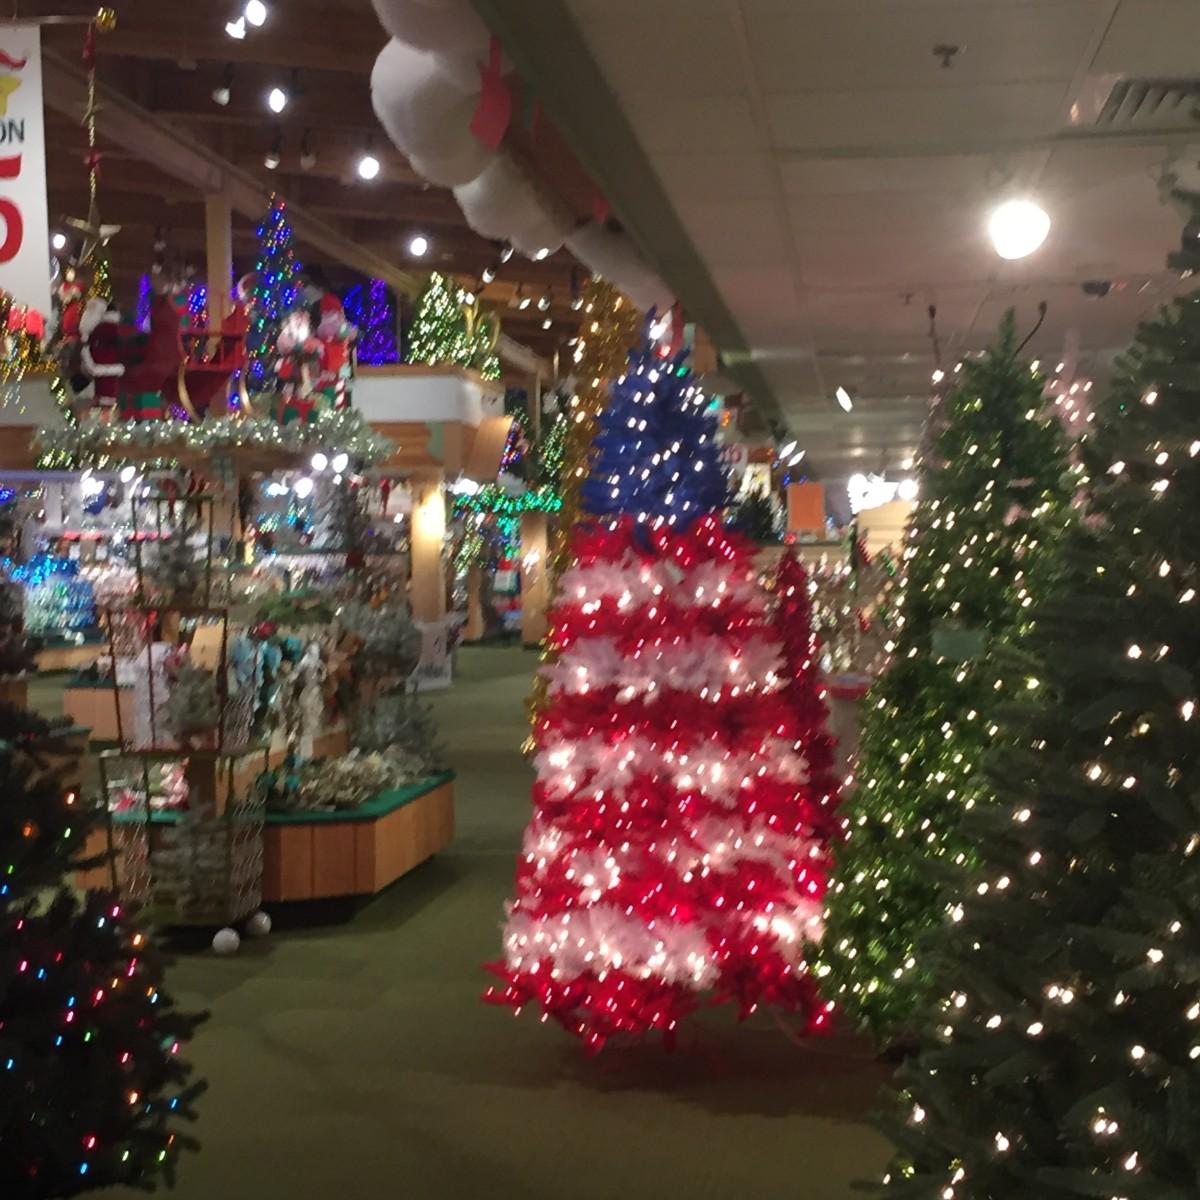 God bless America and God bless Christmas